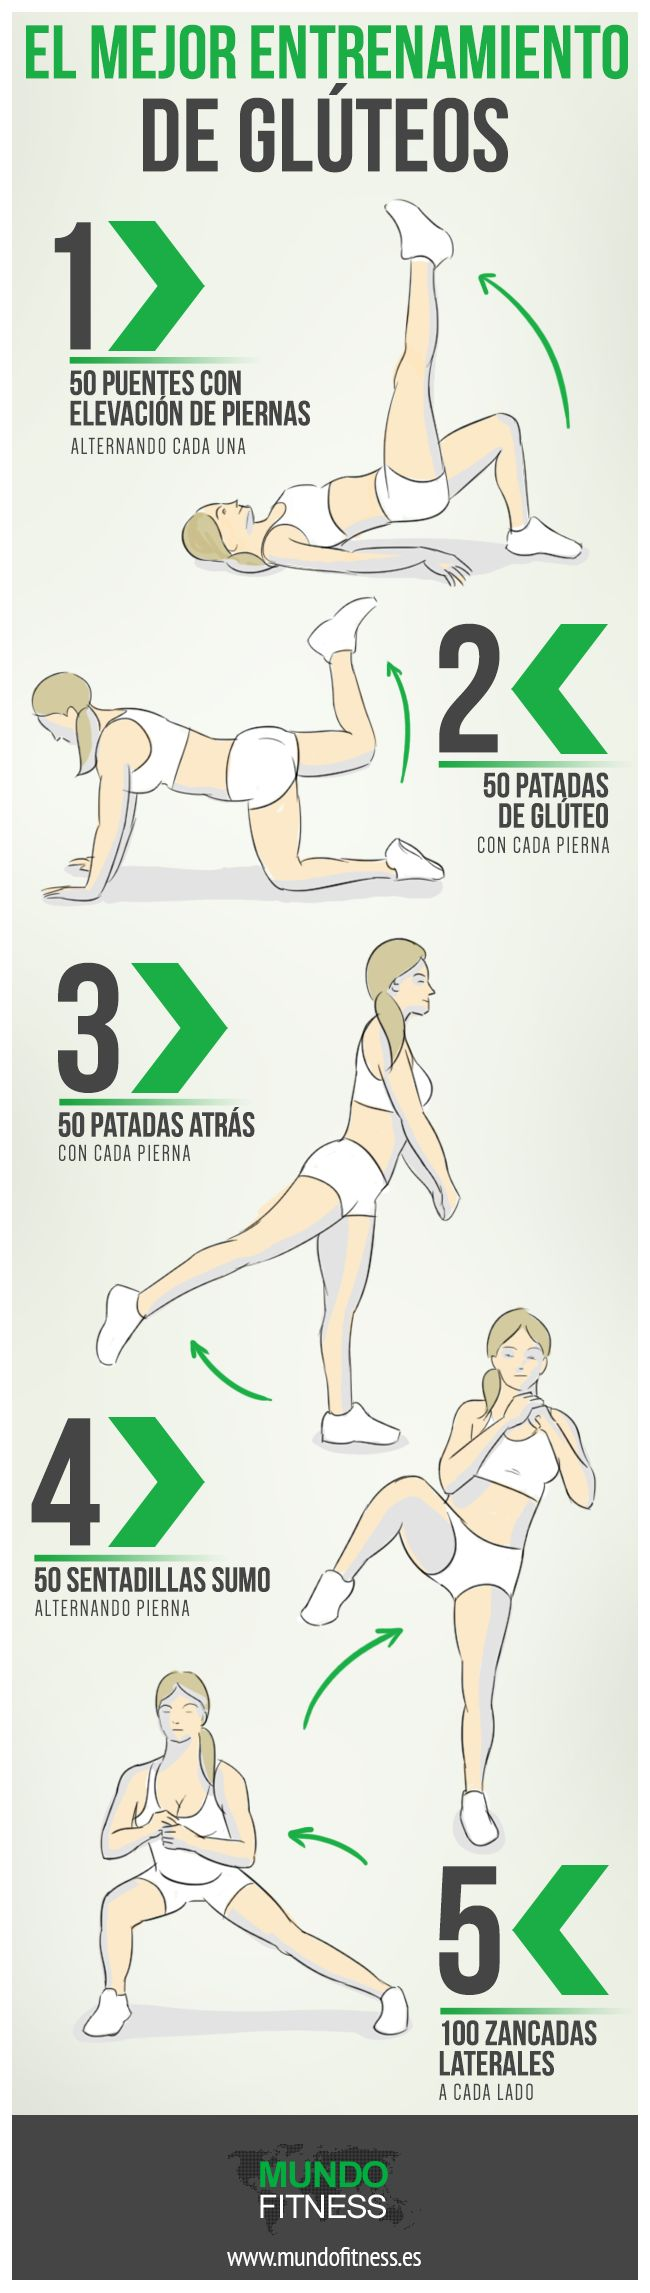 Ejercicios para trabajar glúteos.#fitness #deporte #glúteos